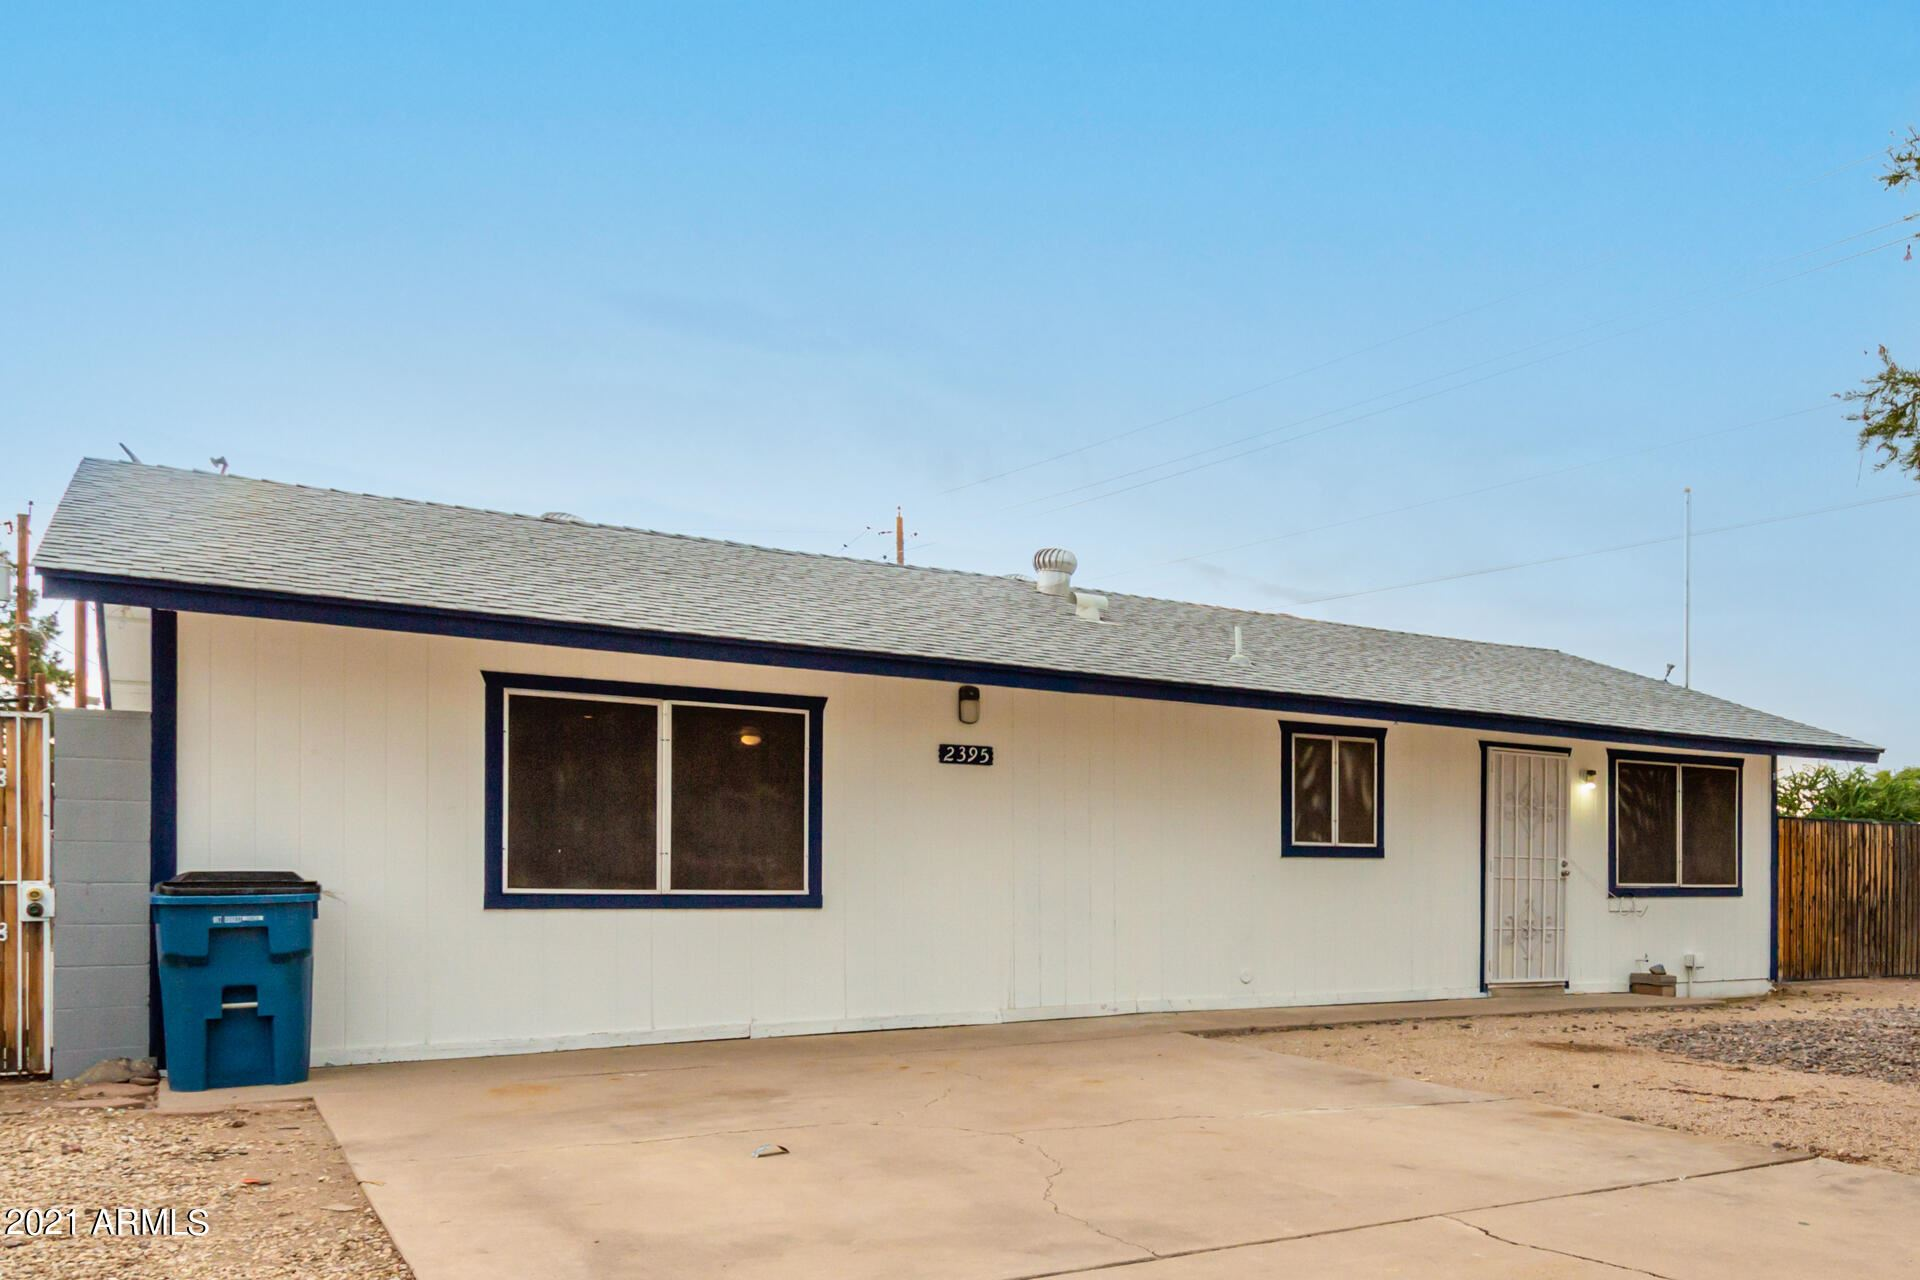 Photo of 2395 S ARIZONA Road, Apache Junction, AZ 85119 (MLS # 6301407)